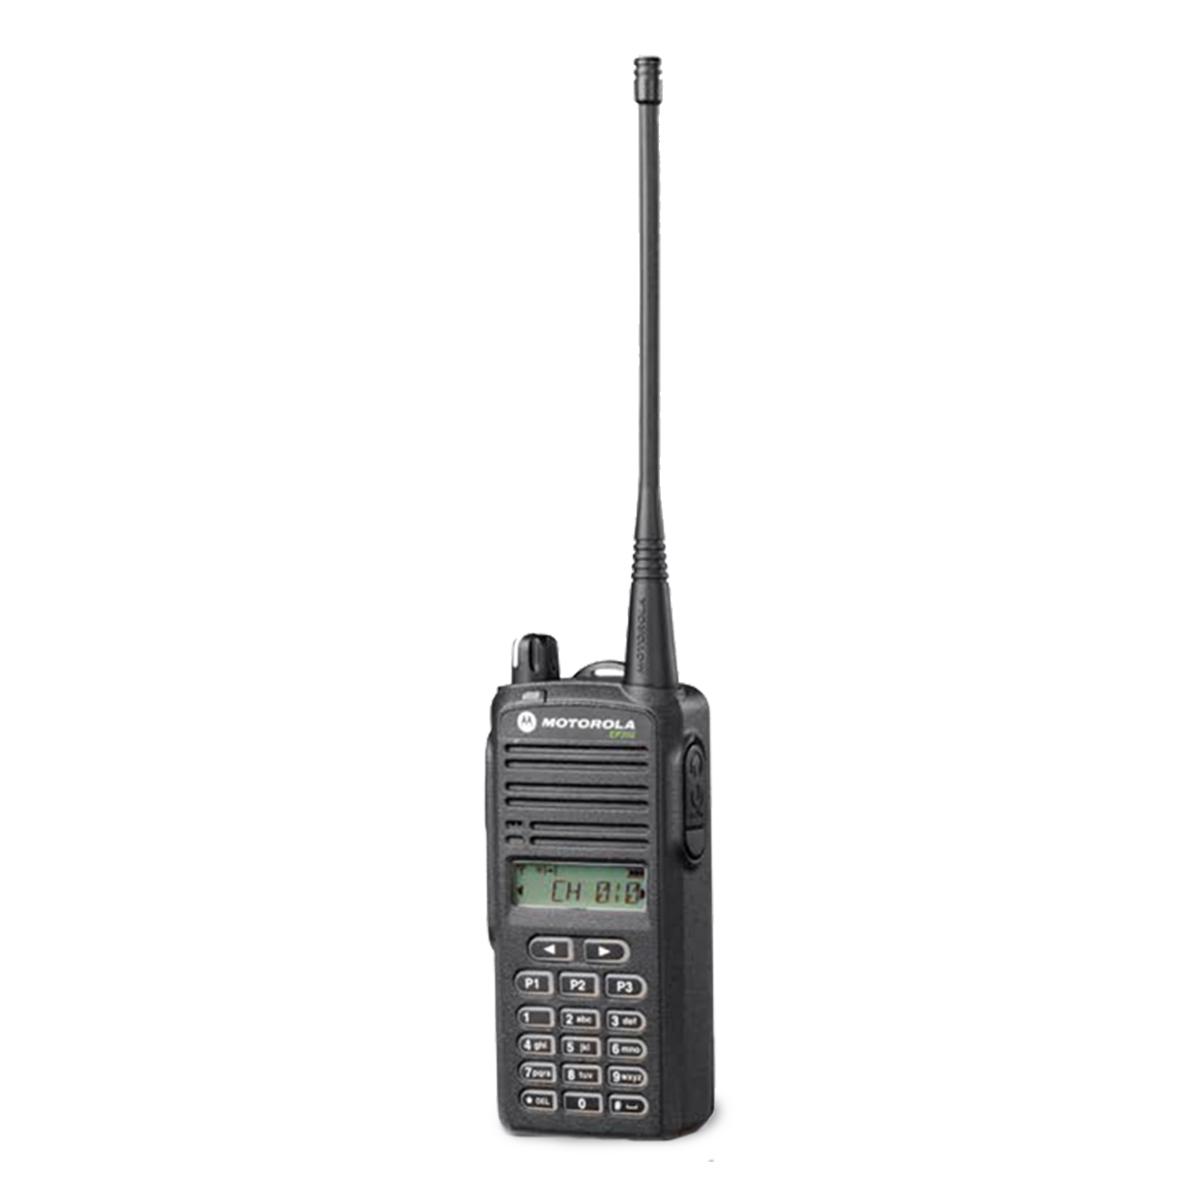 Radio Motorola EP350 MX Analógico LAH03RDK8AB9AN UHF 435-480 MHz con pantalla y teclado completo